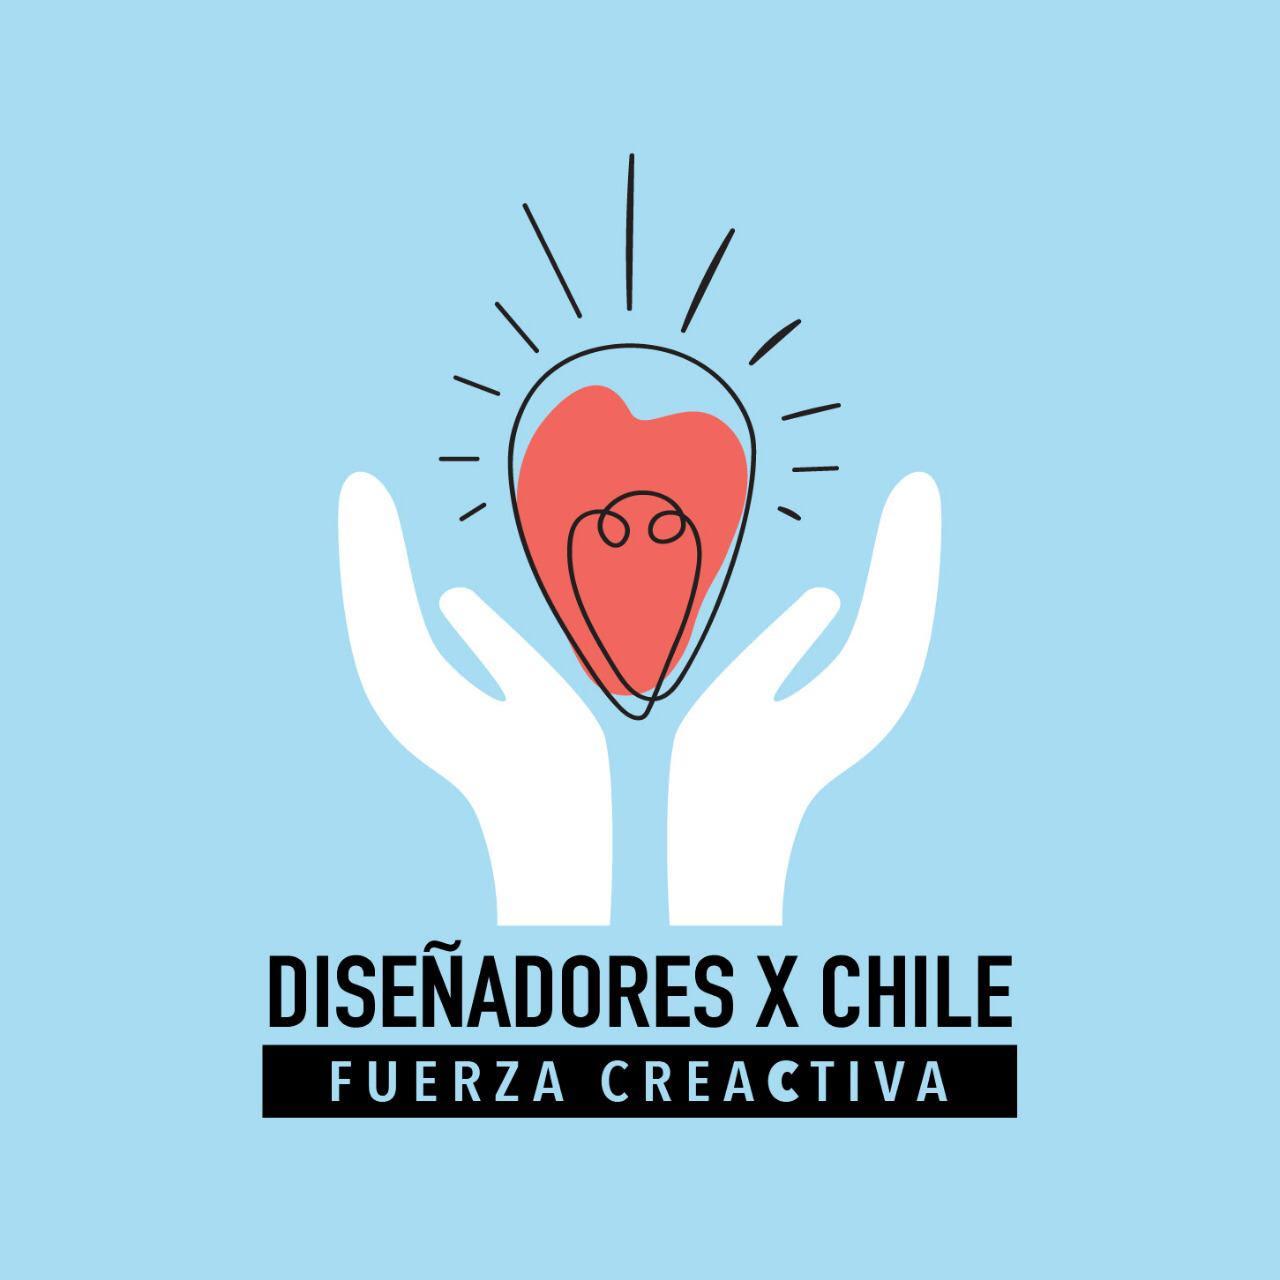 Diseñadores x Chile